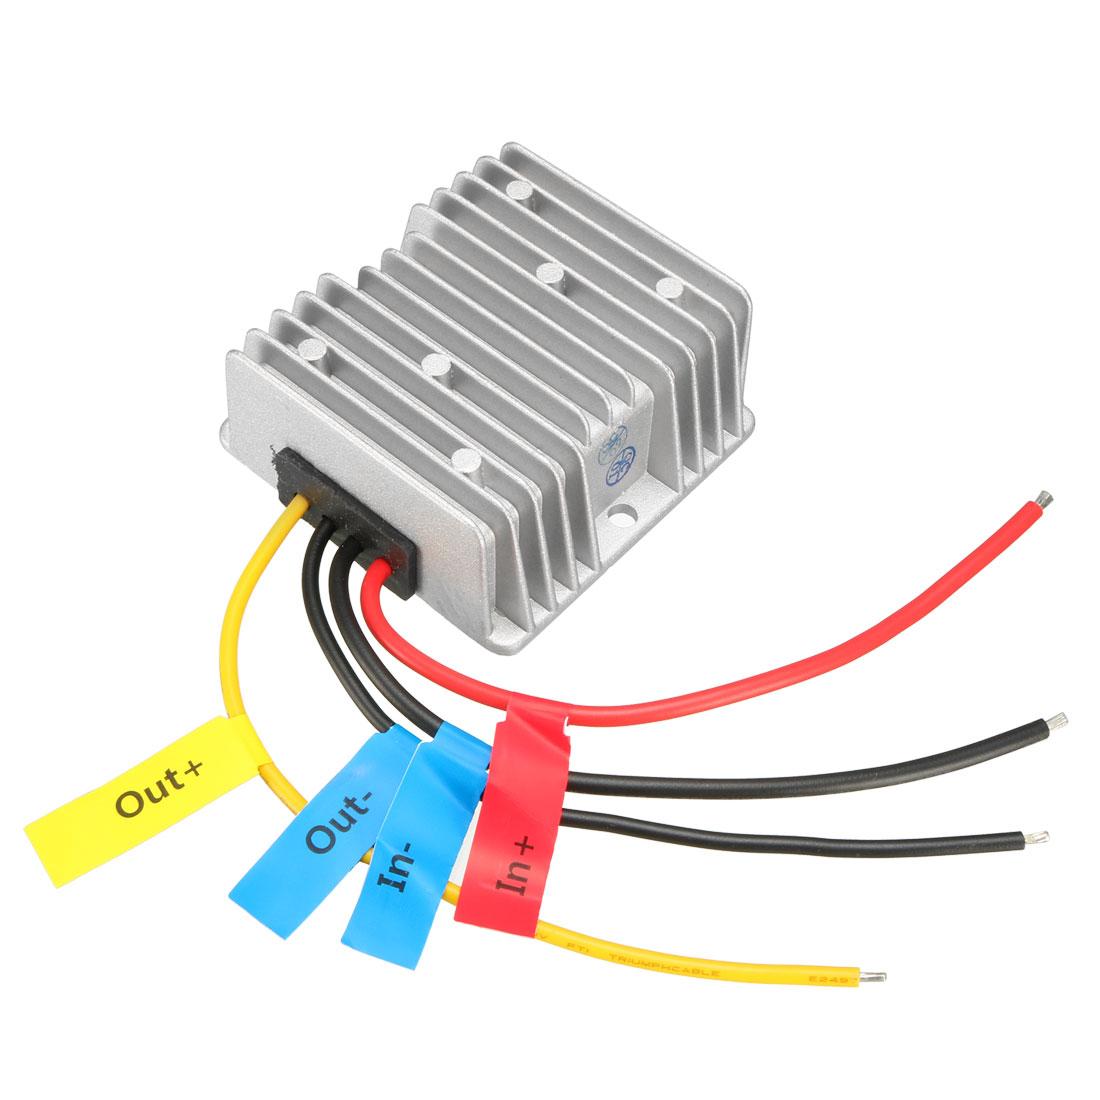 uxcell Power Converter Regulator DC 12V(10V~16V) Step-Up to DC 24V 8A 192W Waterproof Voltage Convert Transformer